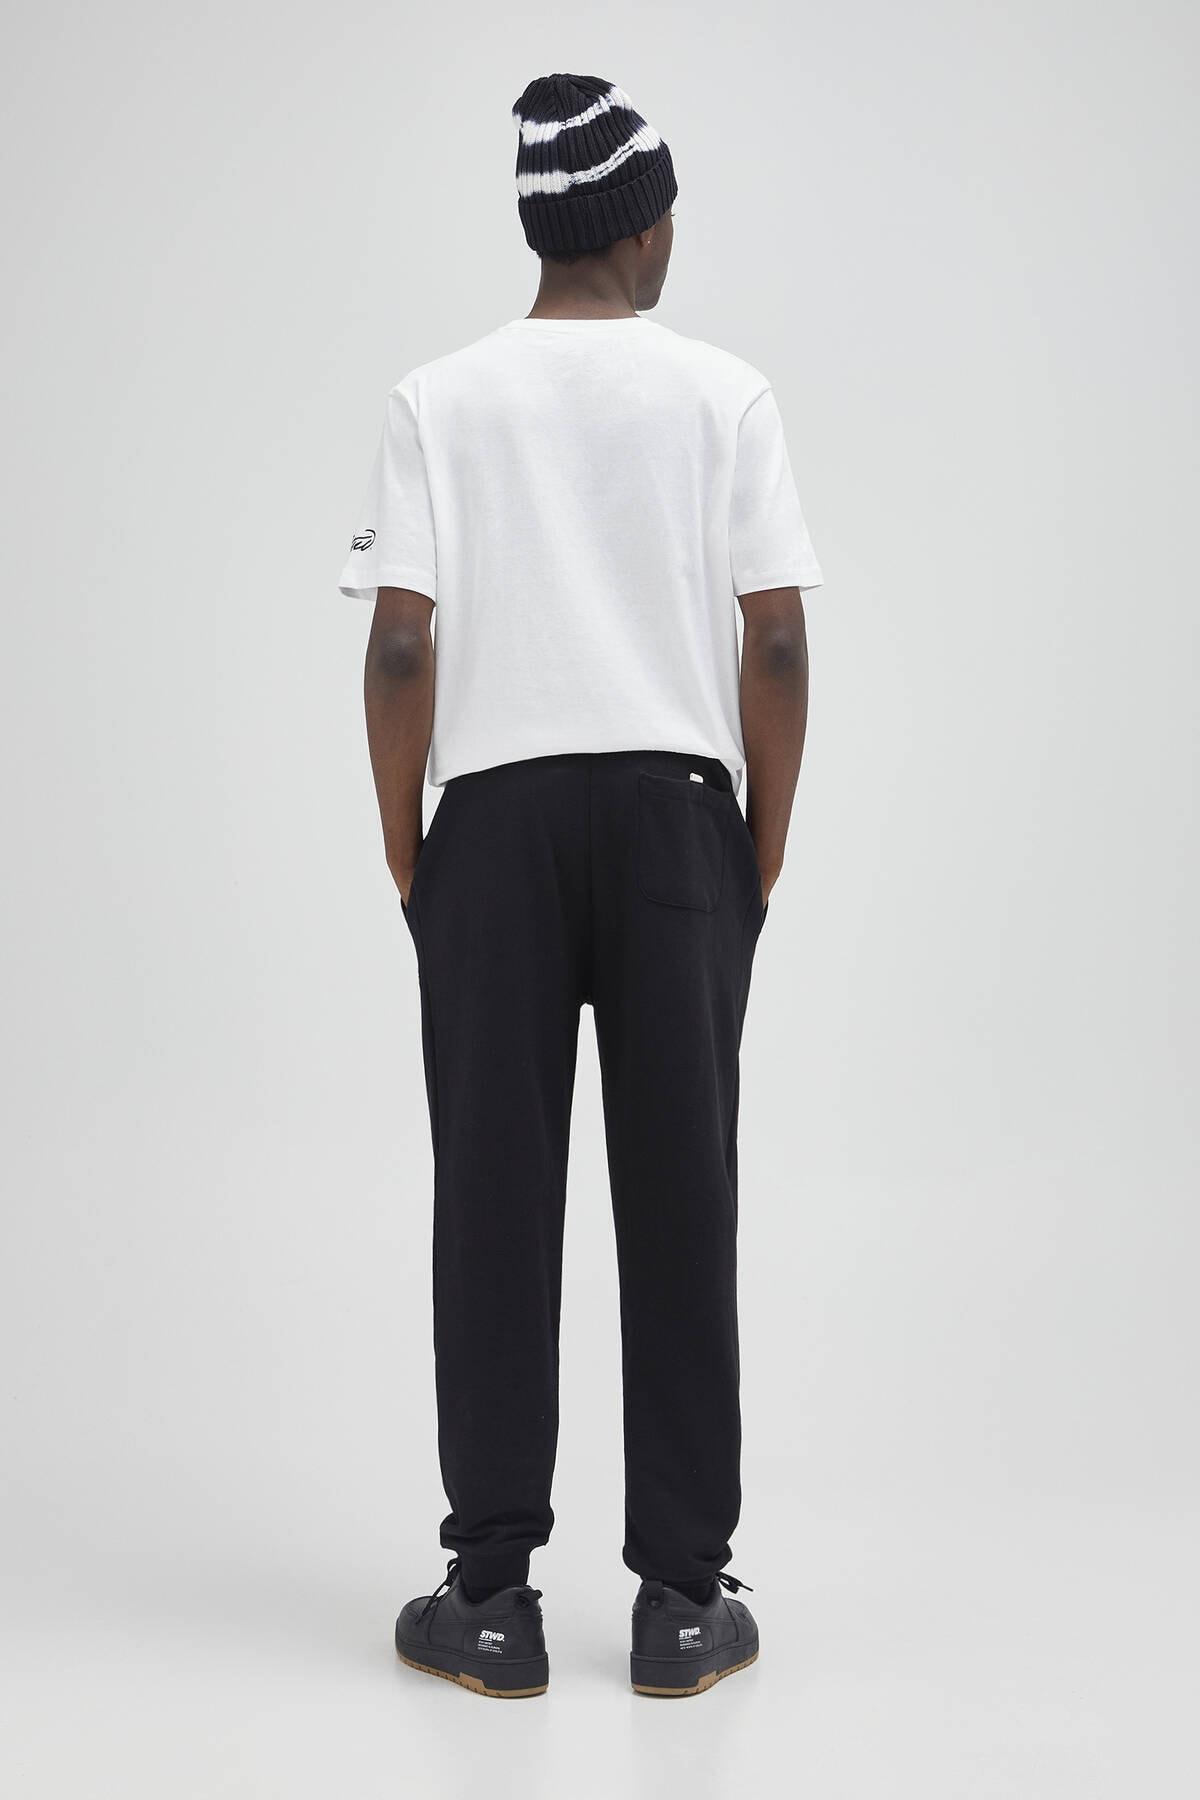 Pull & Bear Erkek Siyah Renkli Jogging Fit Pantolon 04676513 3